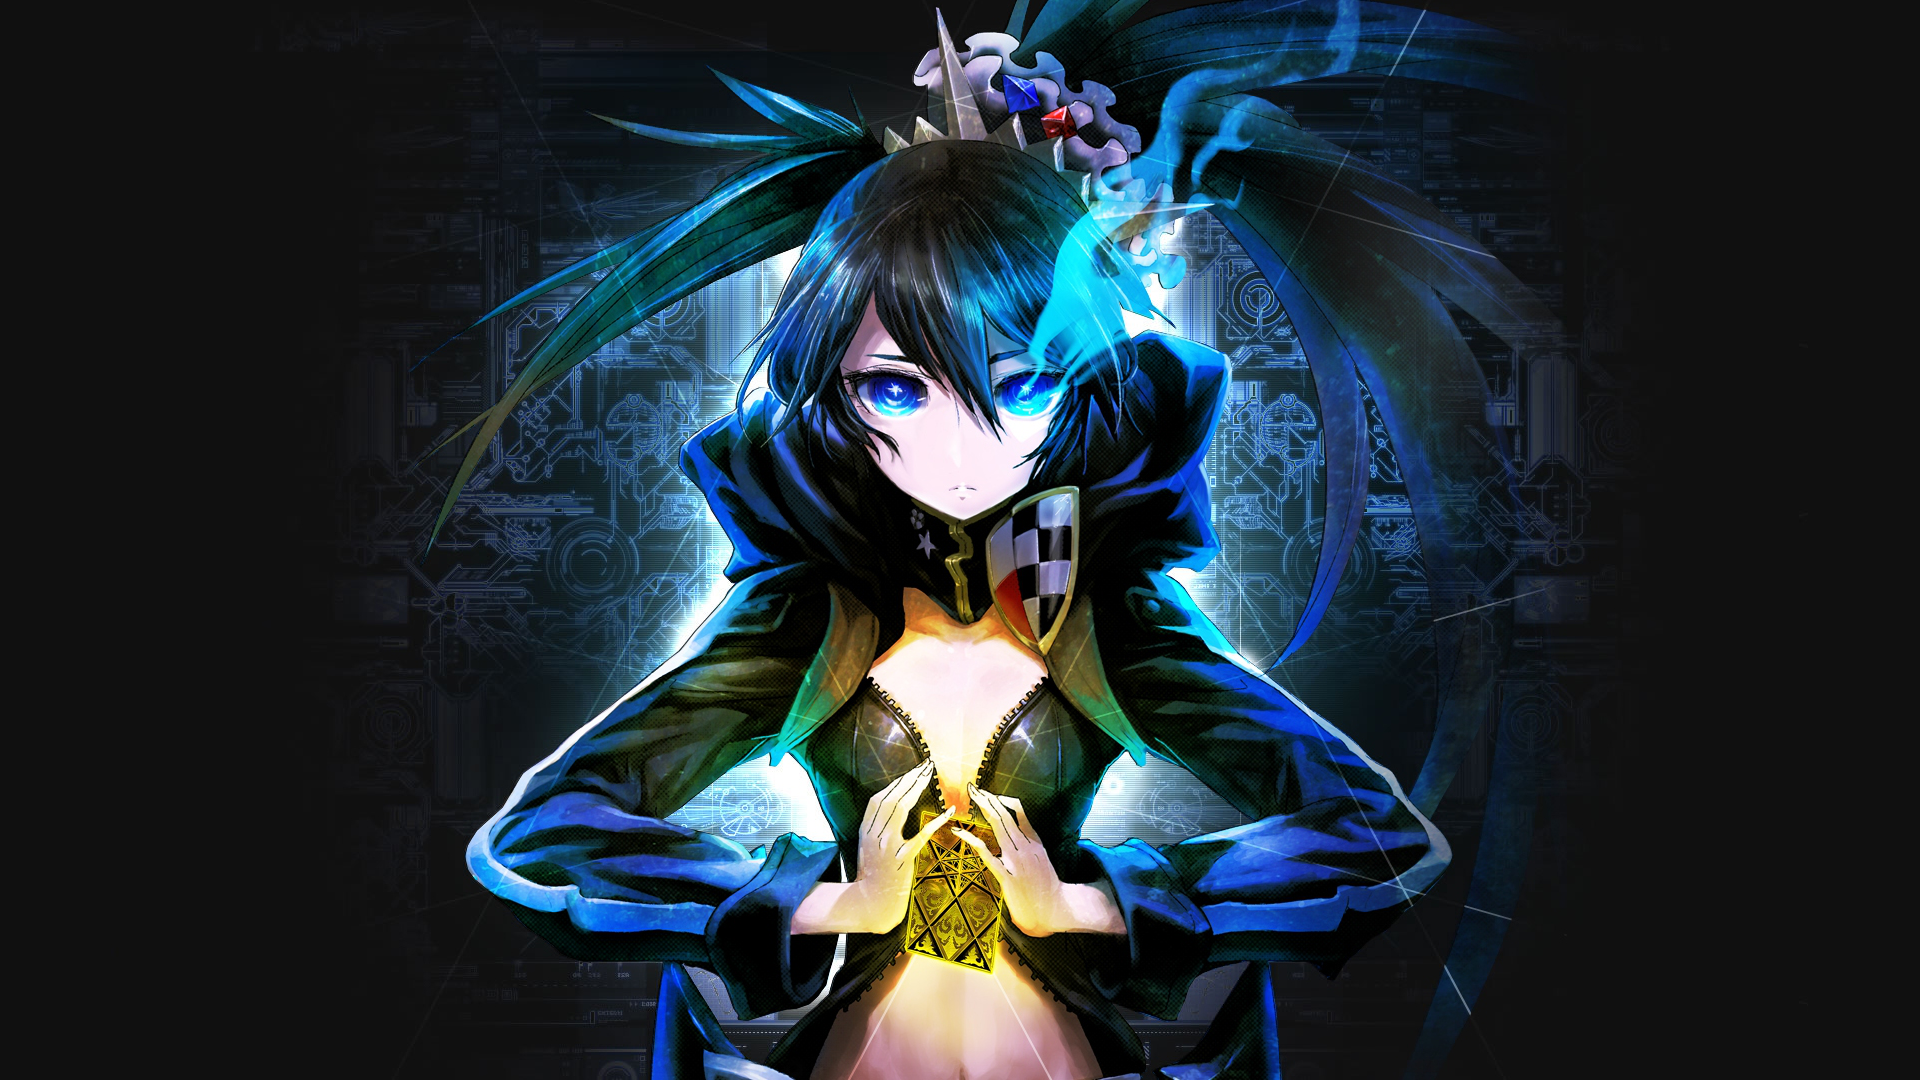 black rock shooter anime wallpaper 1920x1080 69610